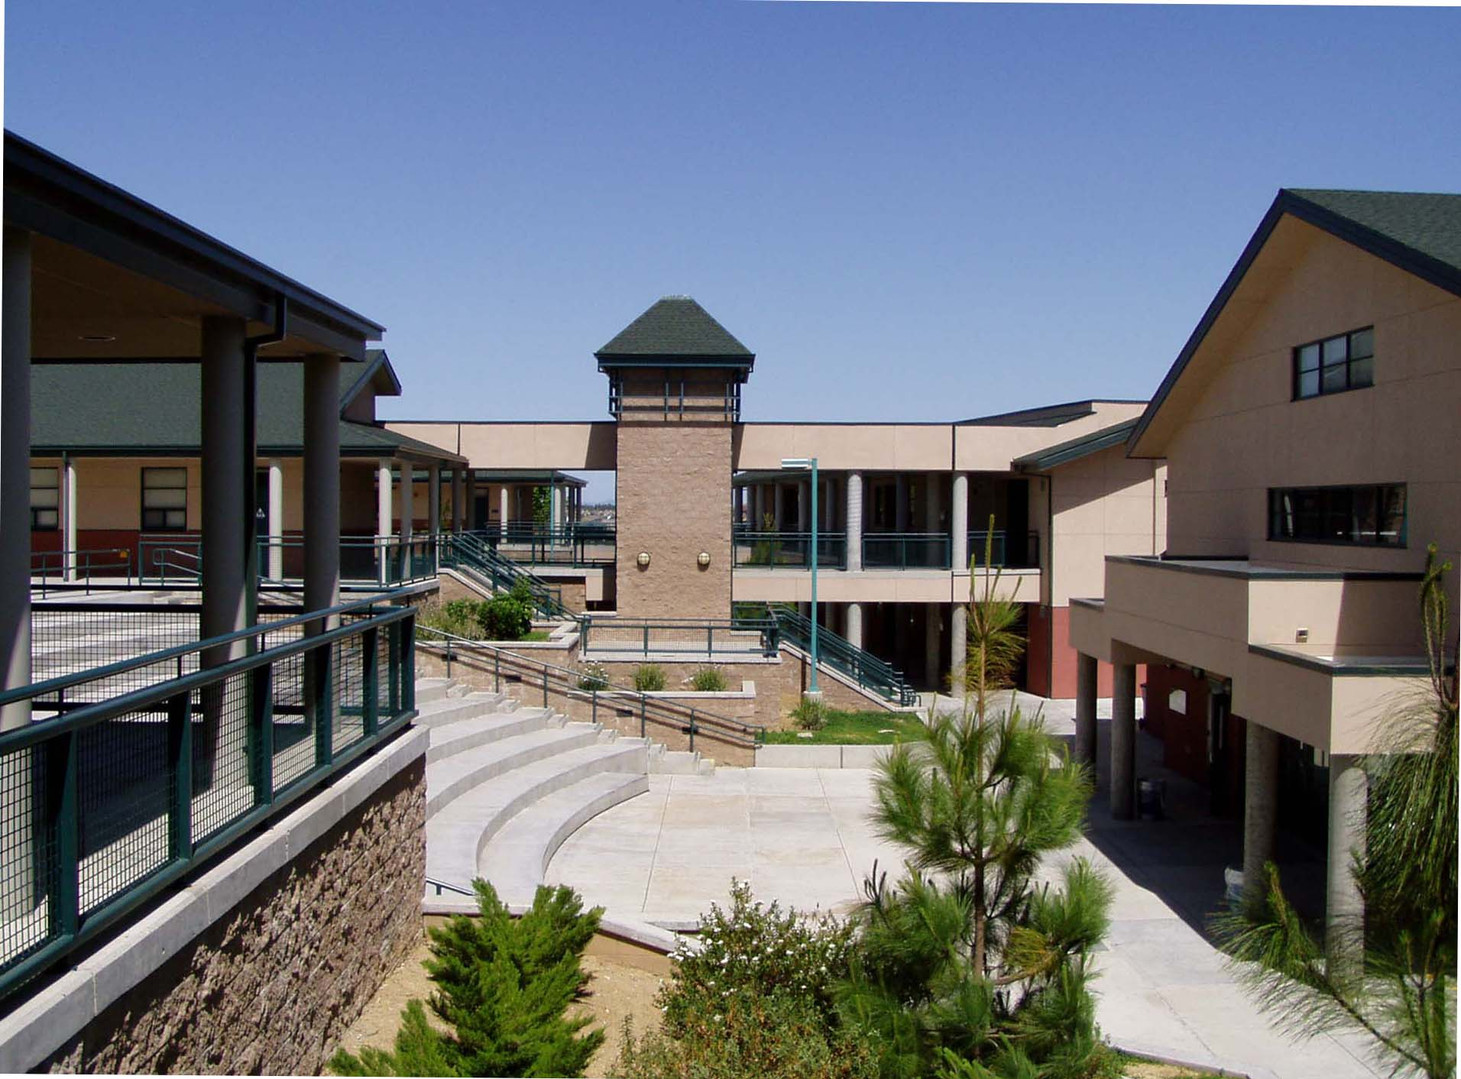 Diablo Vista Elementary School Central Amphitheater